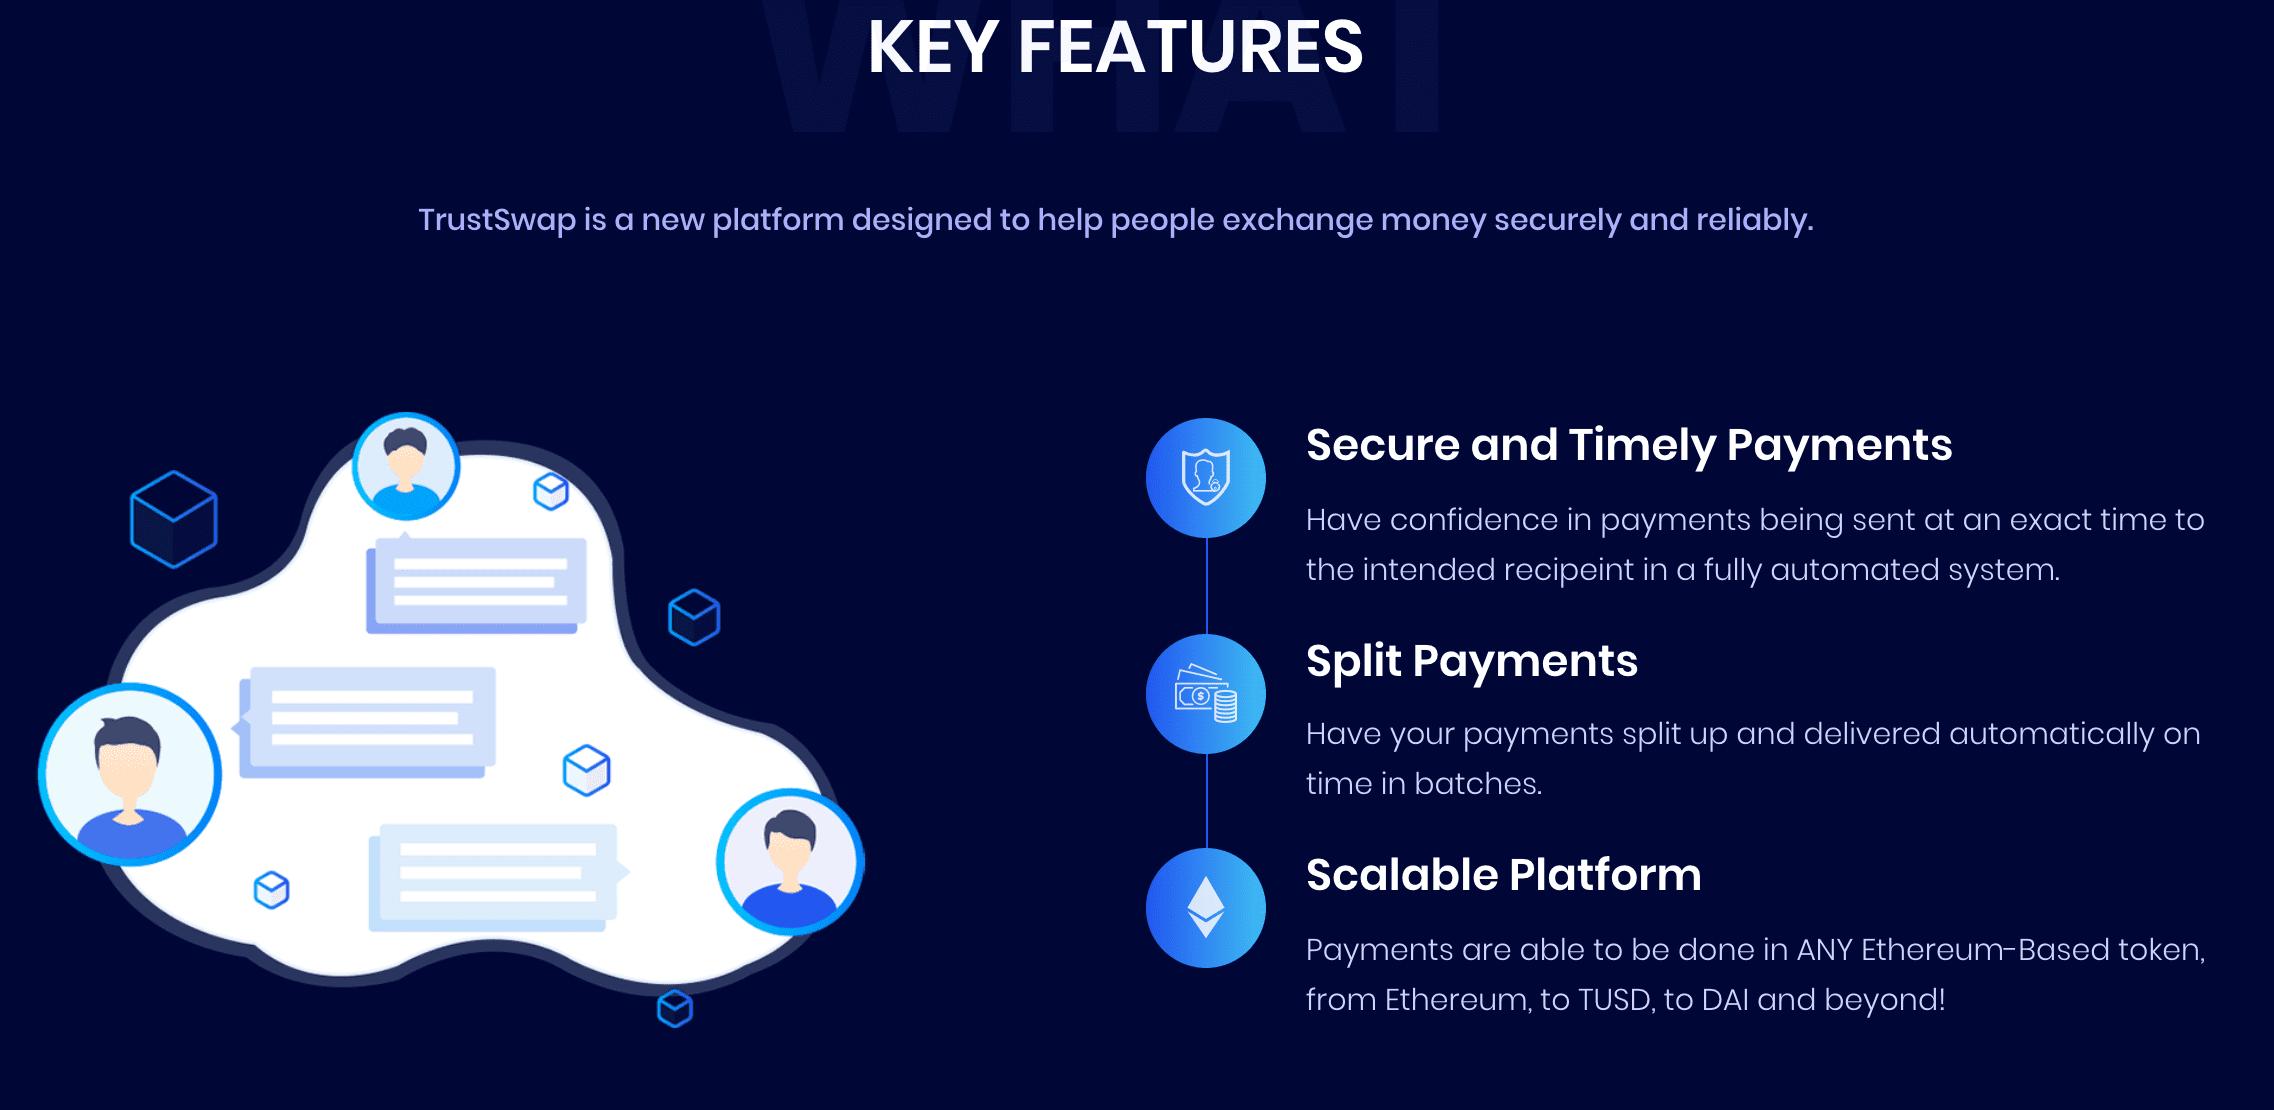 Trust swap key features